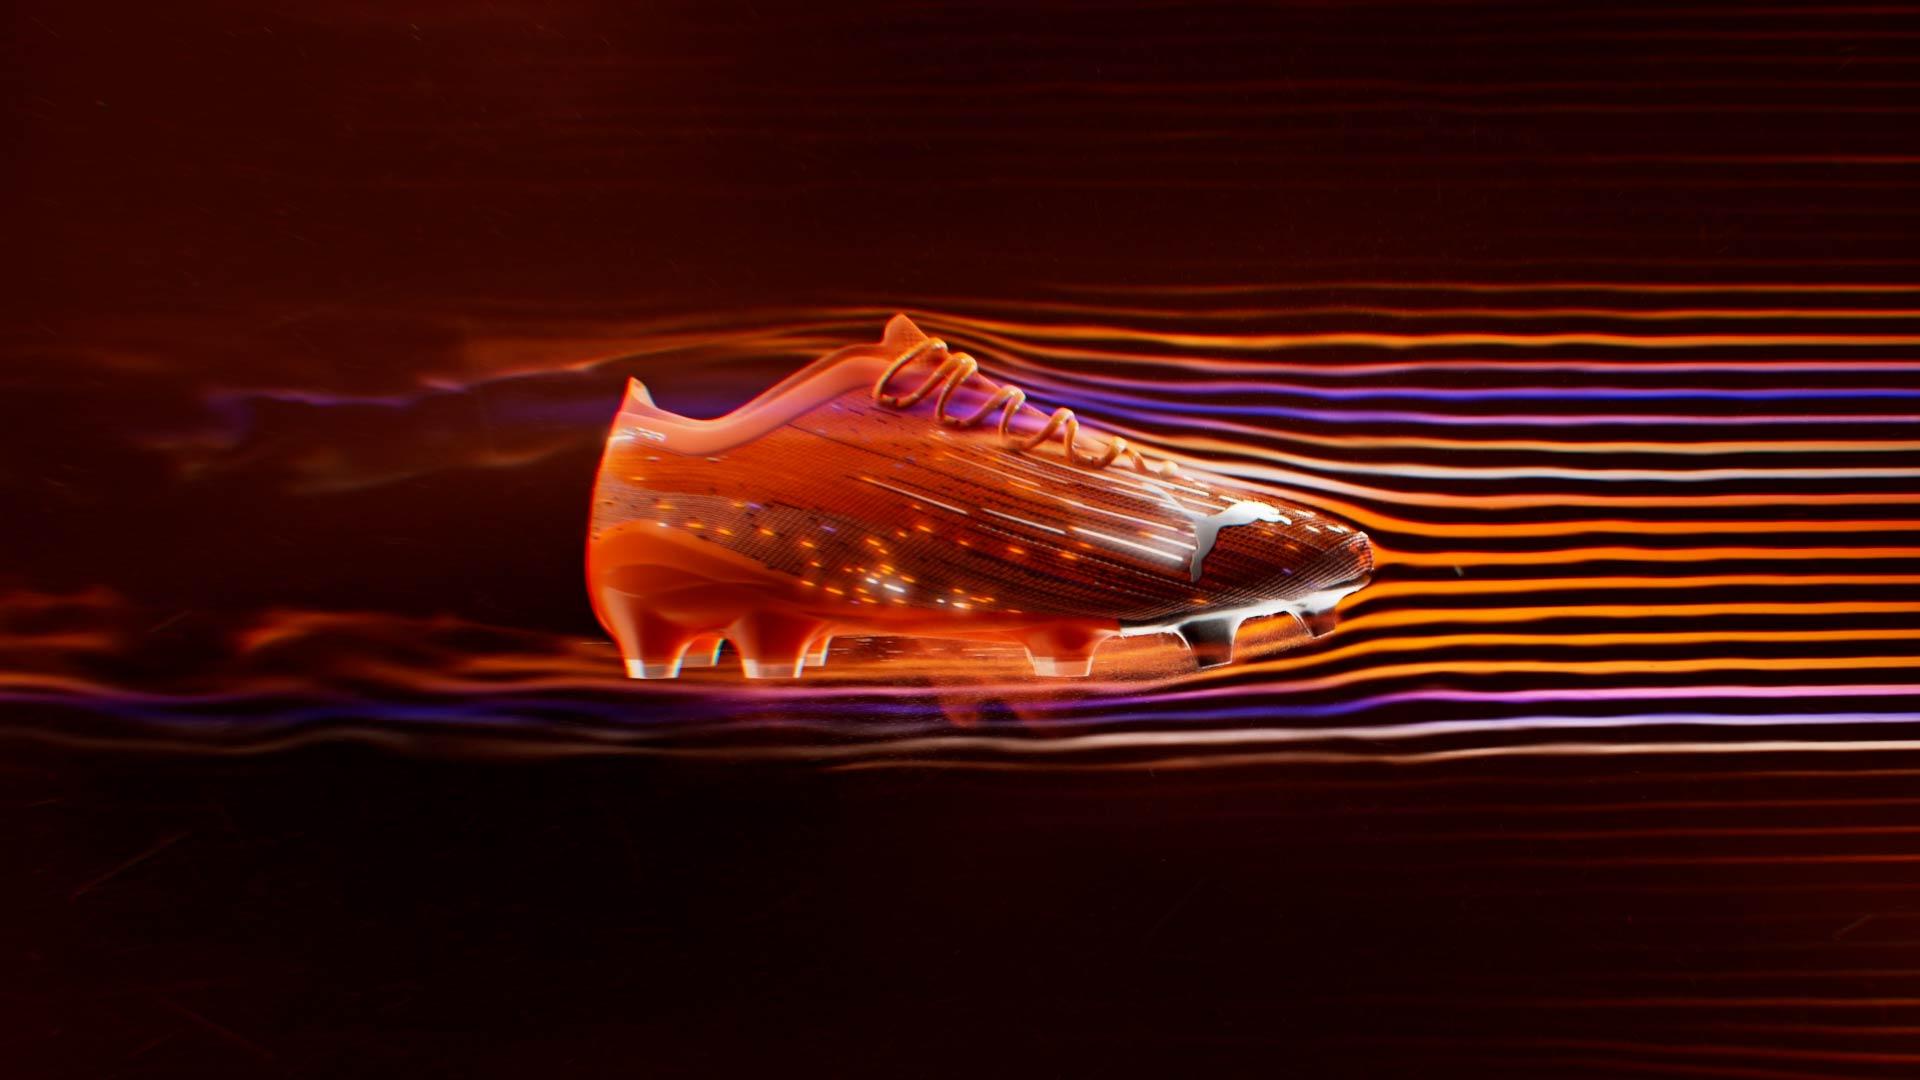 Aerodynamic 3D smoke simulation around the soccer shoe